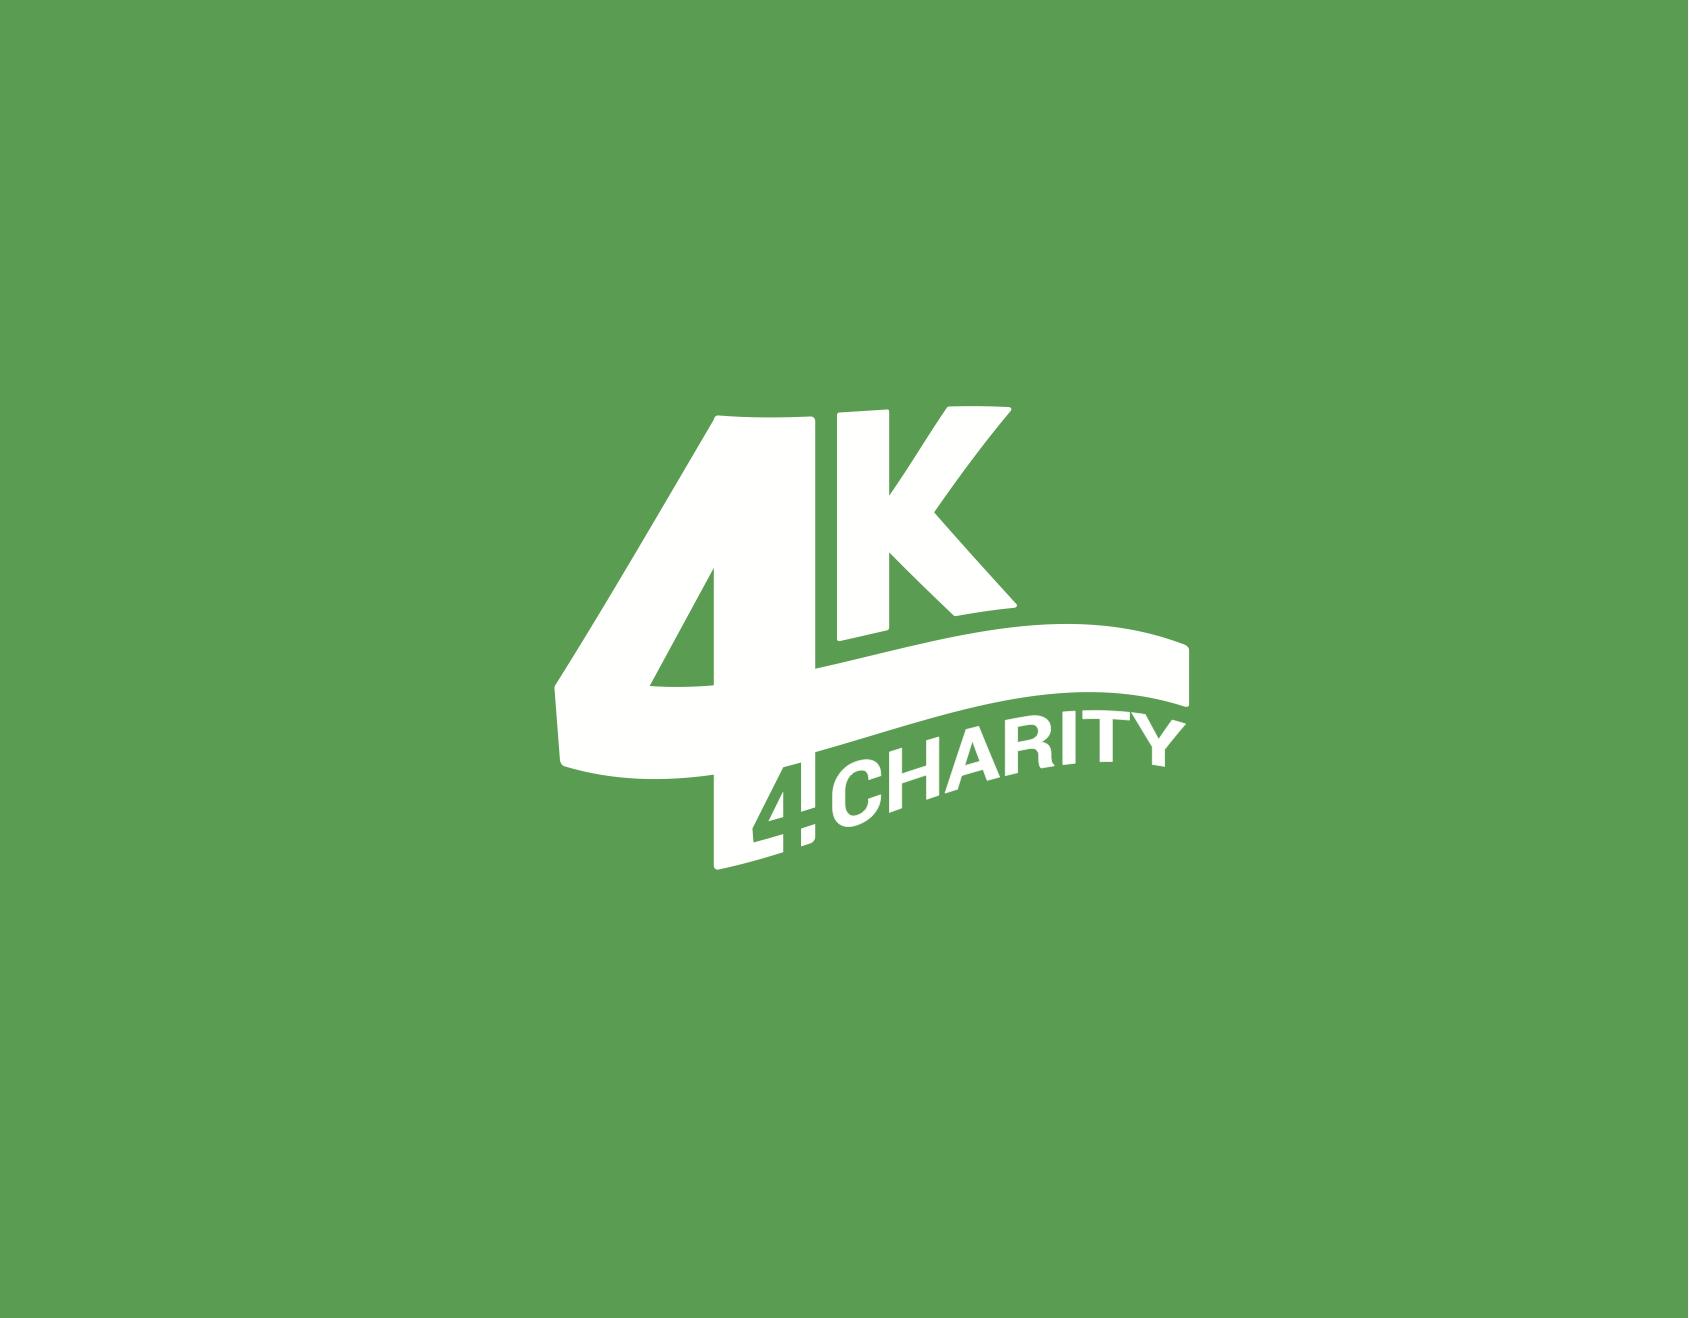 4K4Charity Logo